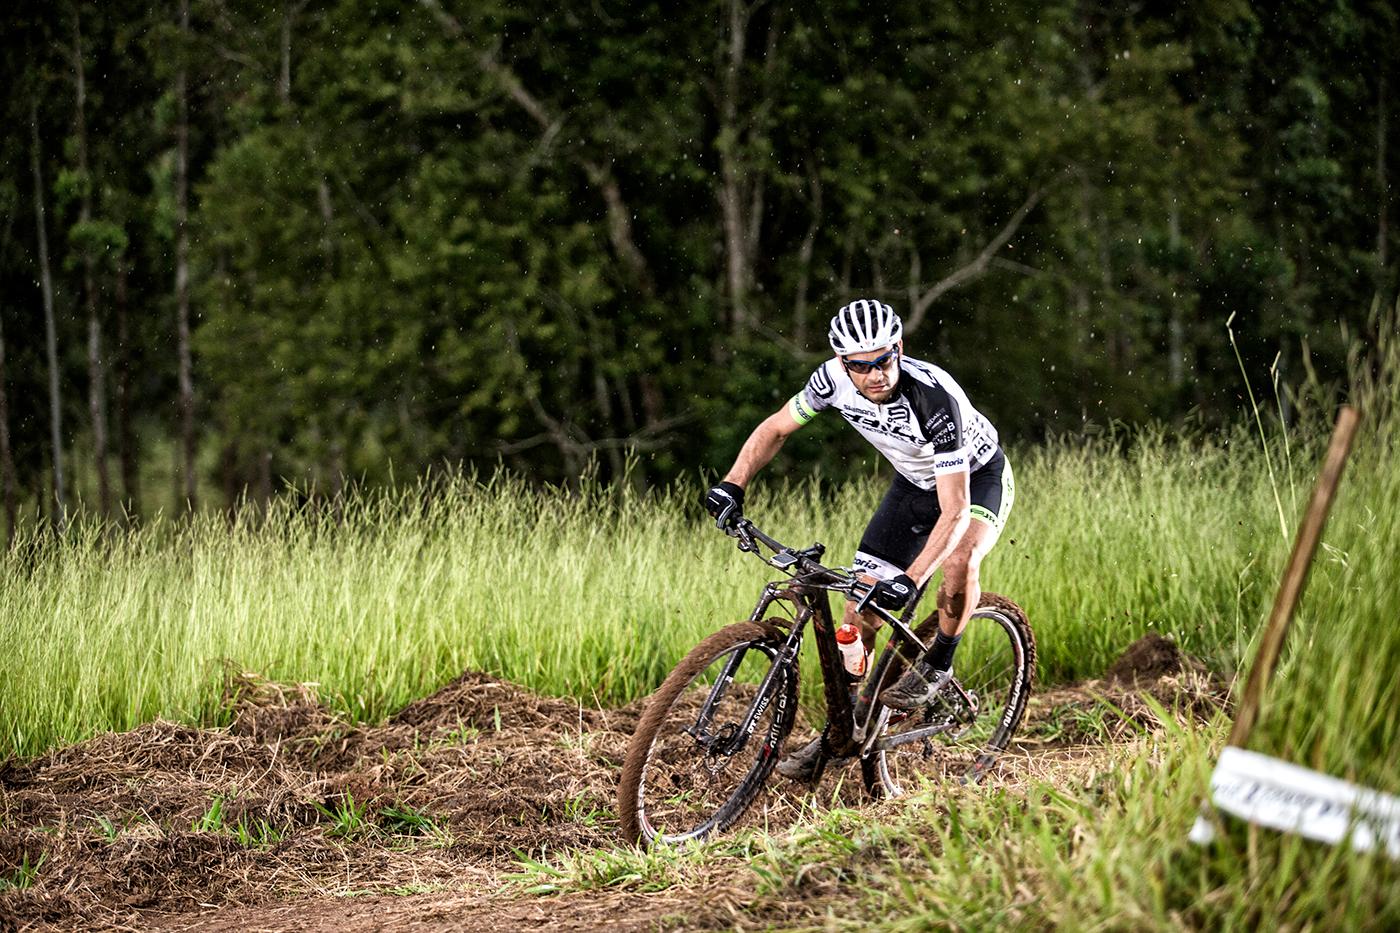 cycling wear uniform jersey Gabriel Delfino Delfino Design uniforme de ciclismo uniforme de MTB softy goods Cycling clothing jersey bike